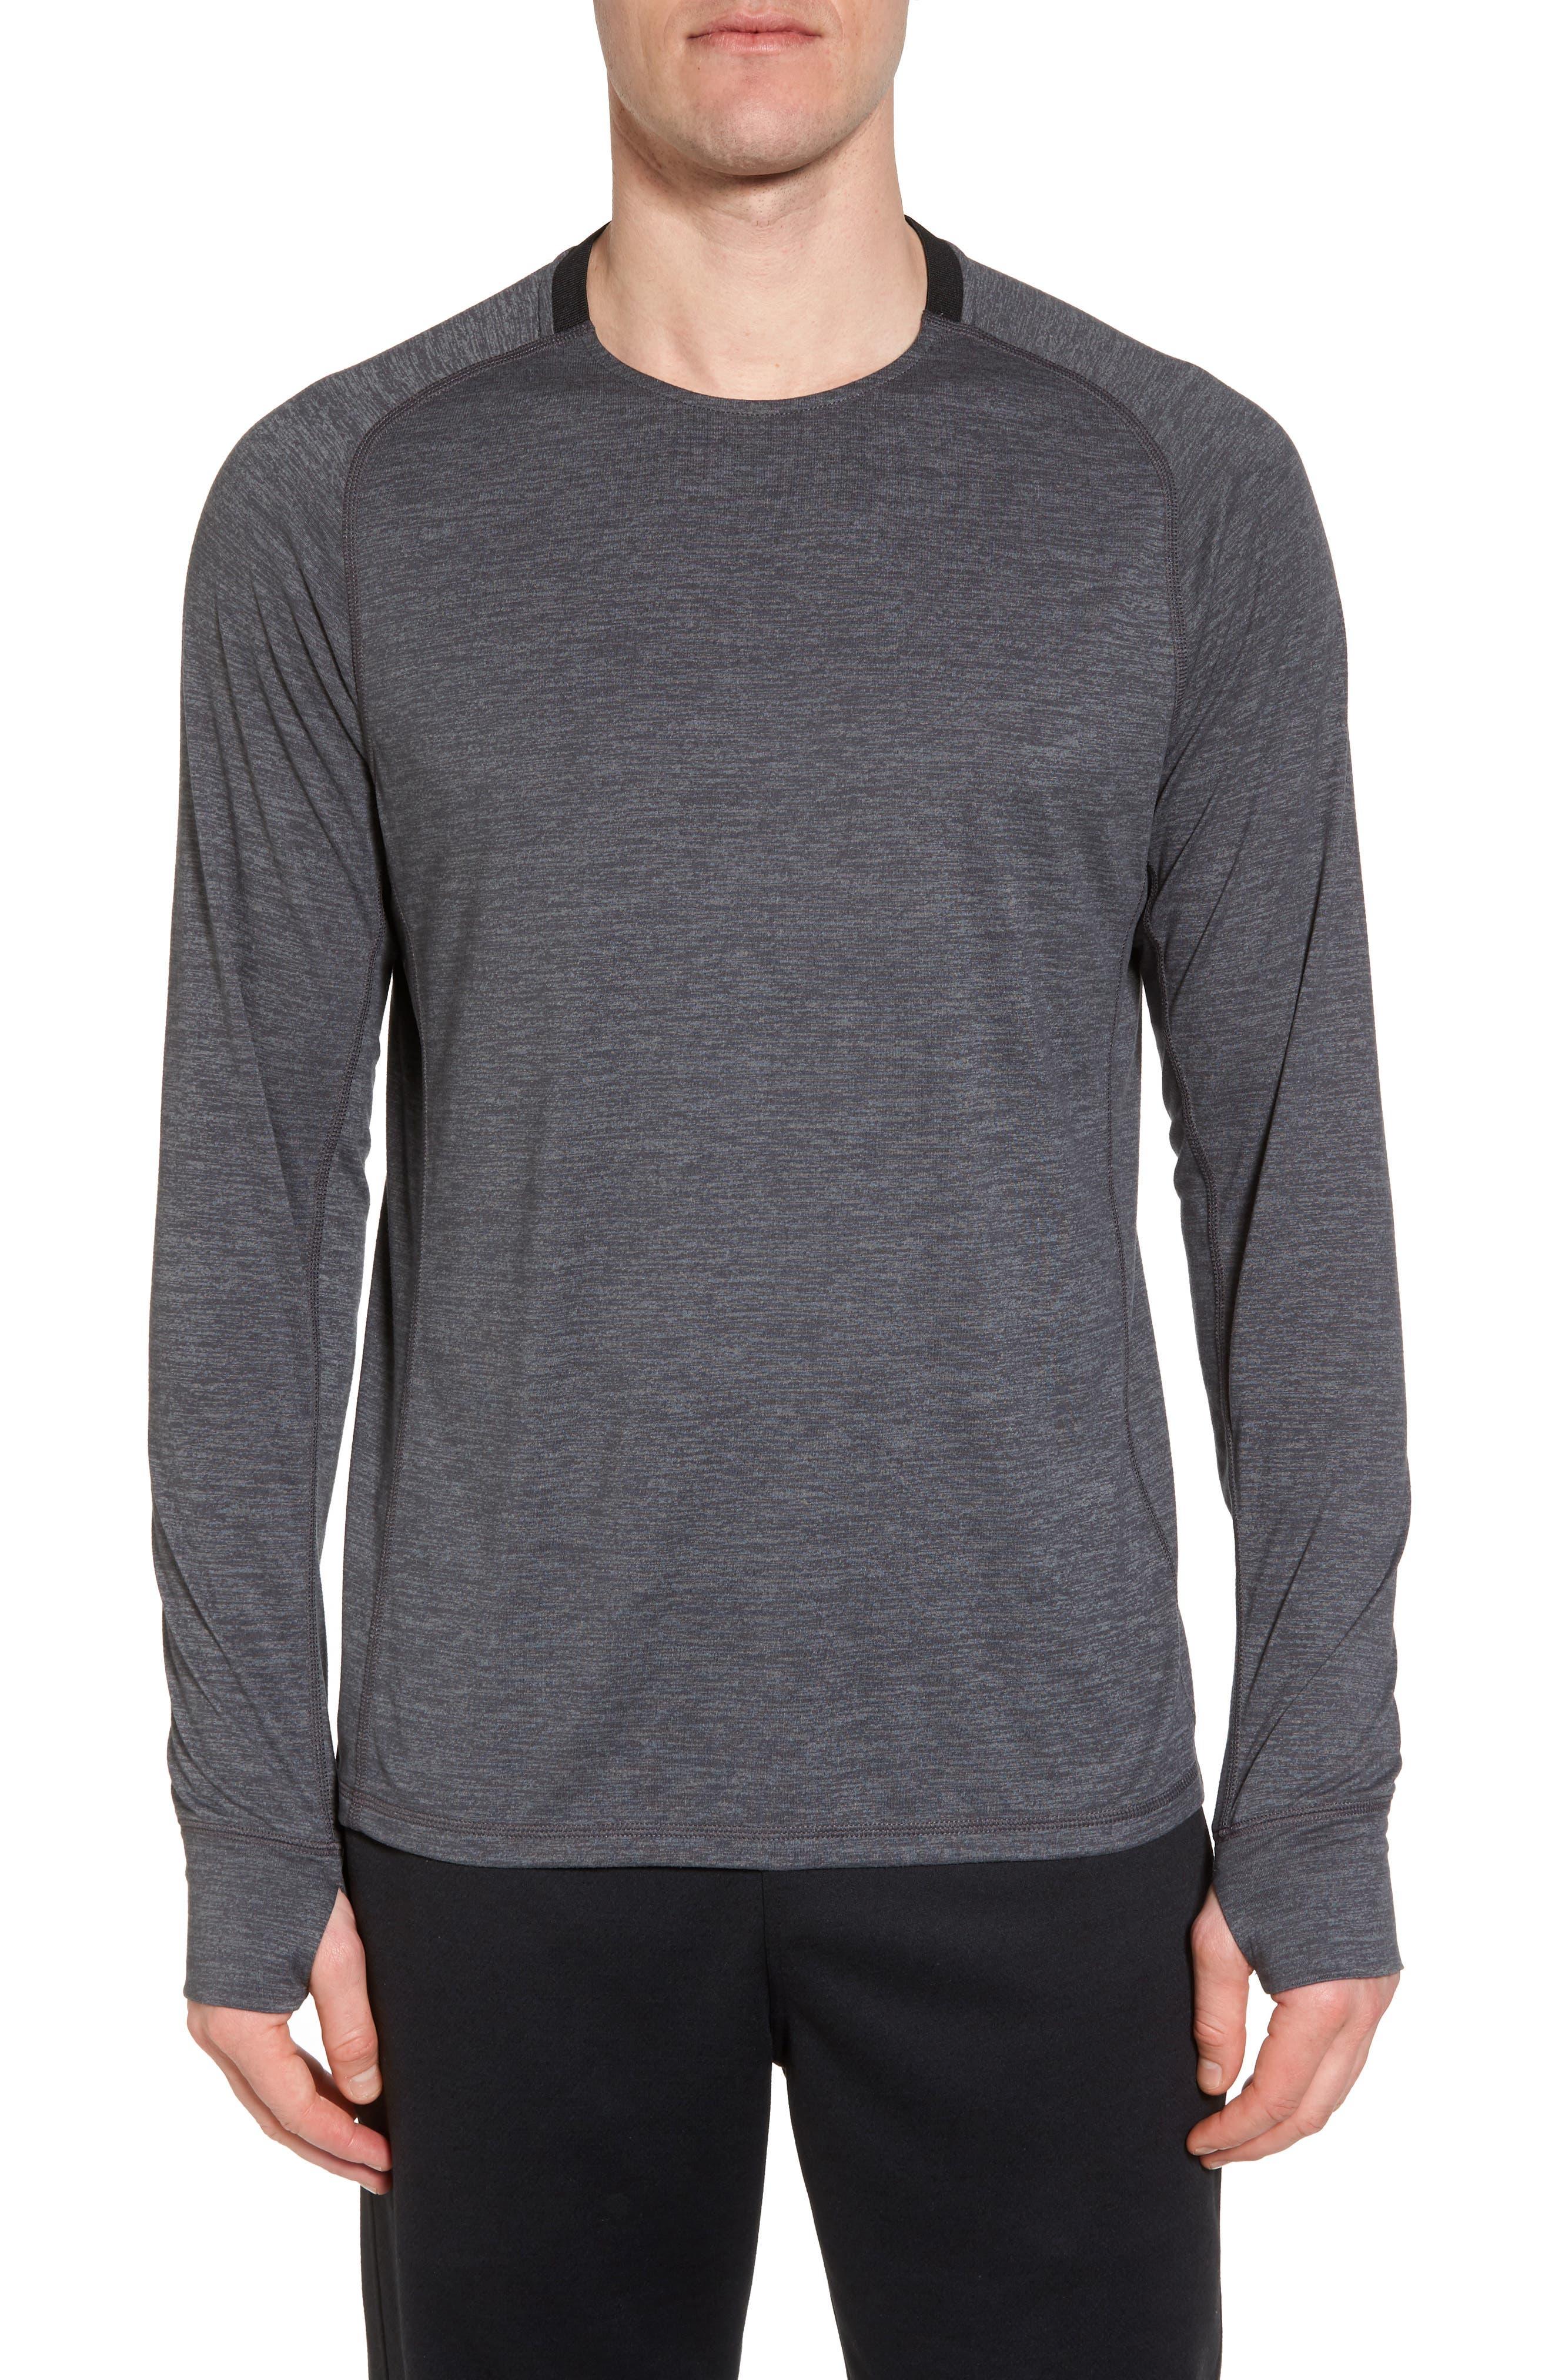 Larosite Athletic Fit T-Shirt,                         Main,                         color, GREY EBONY MELANGE